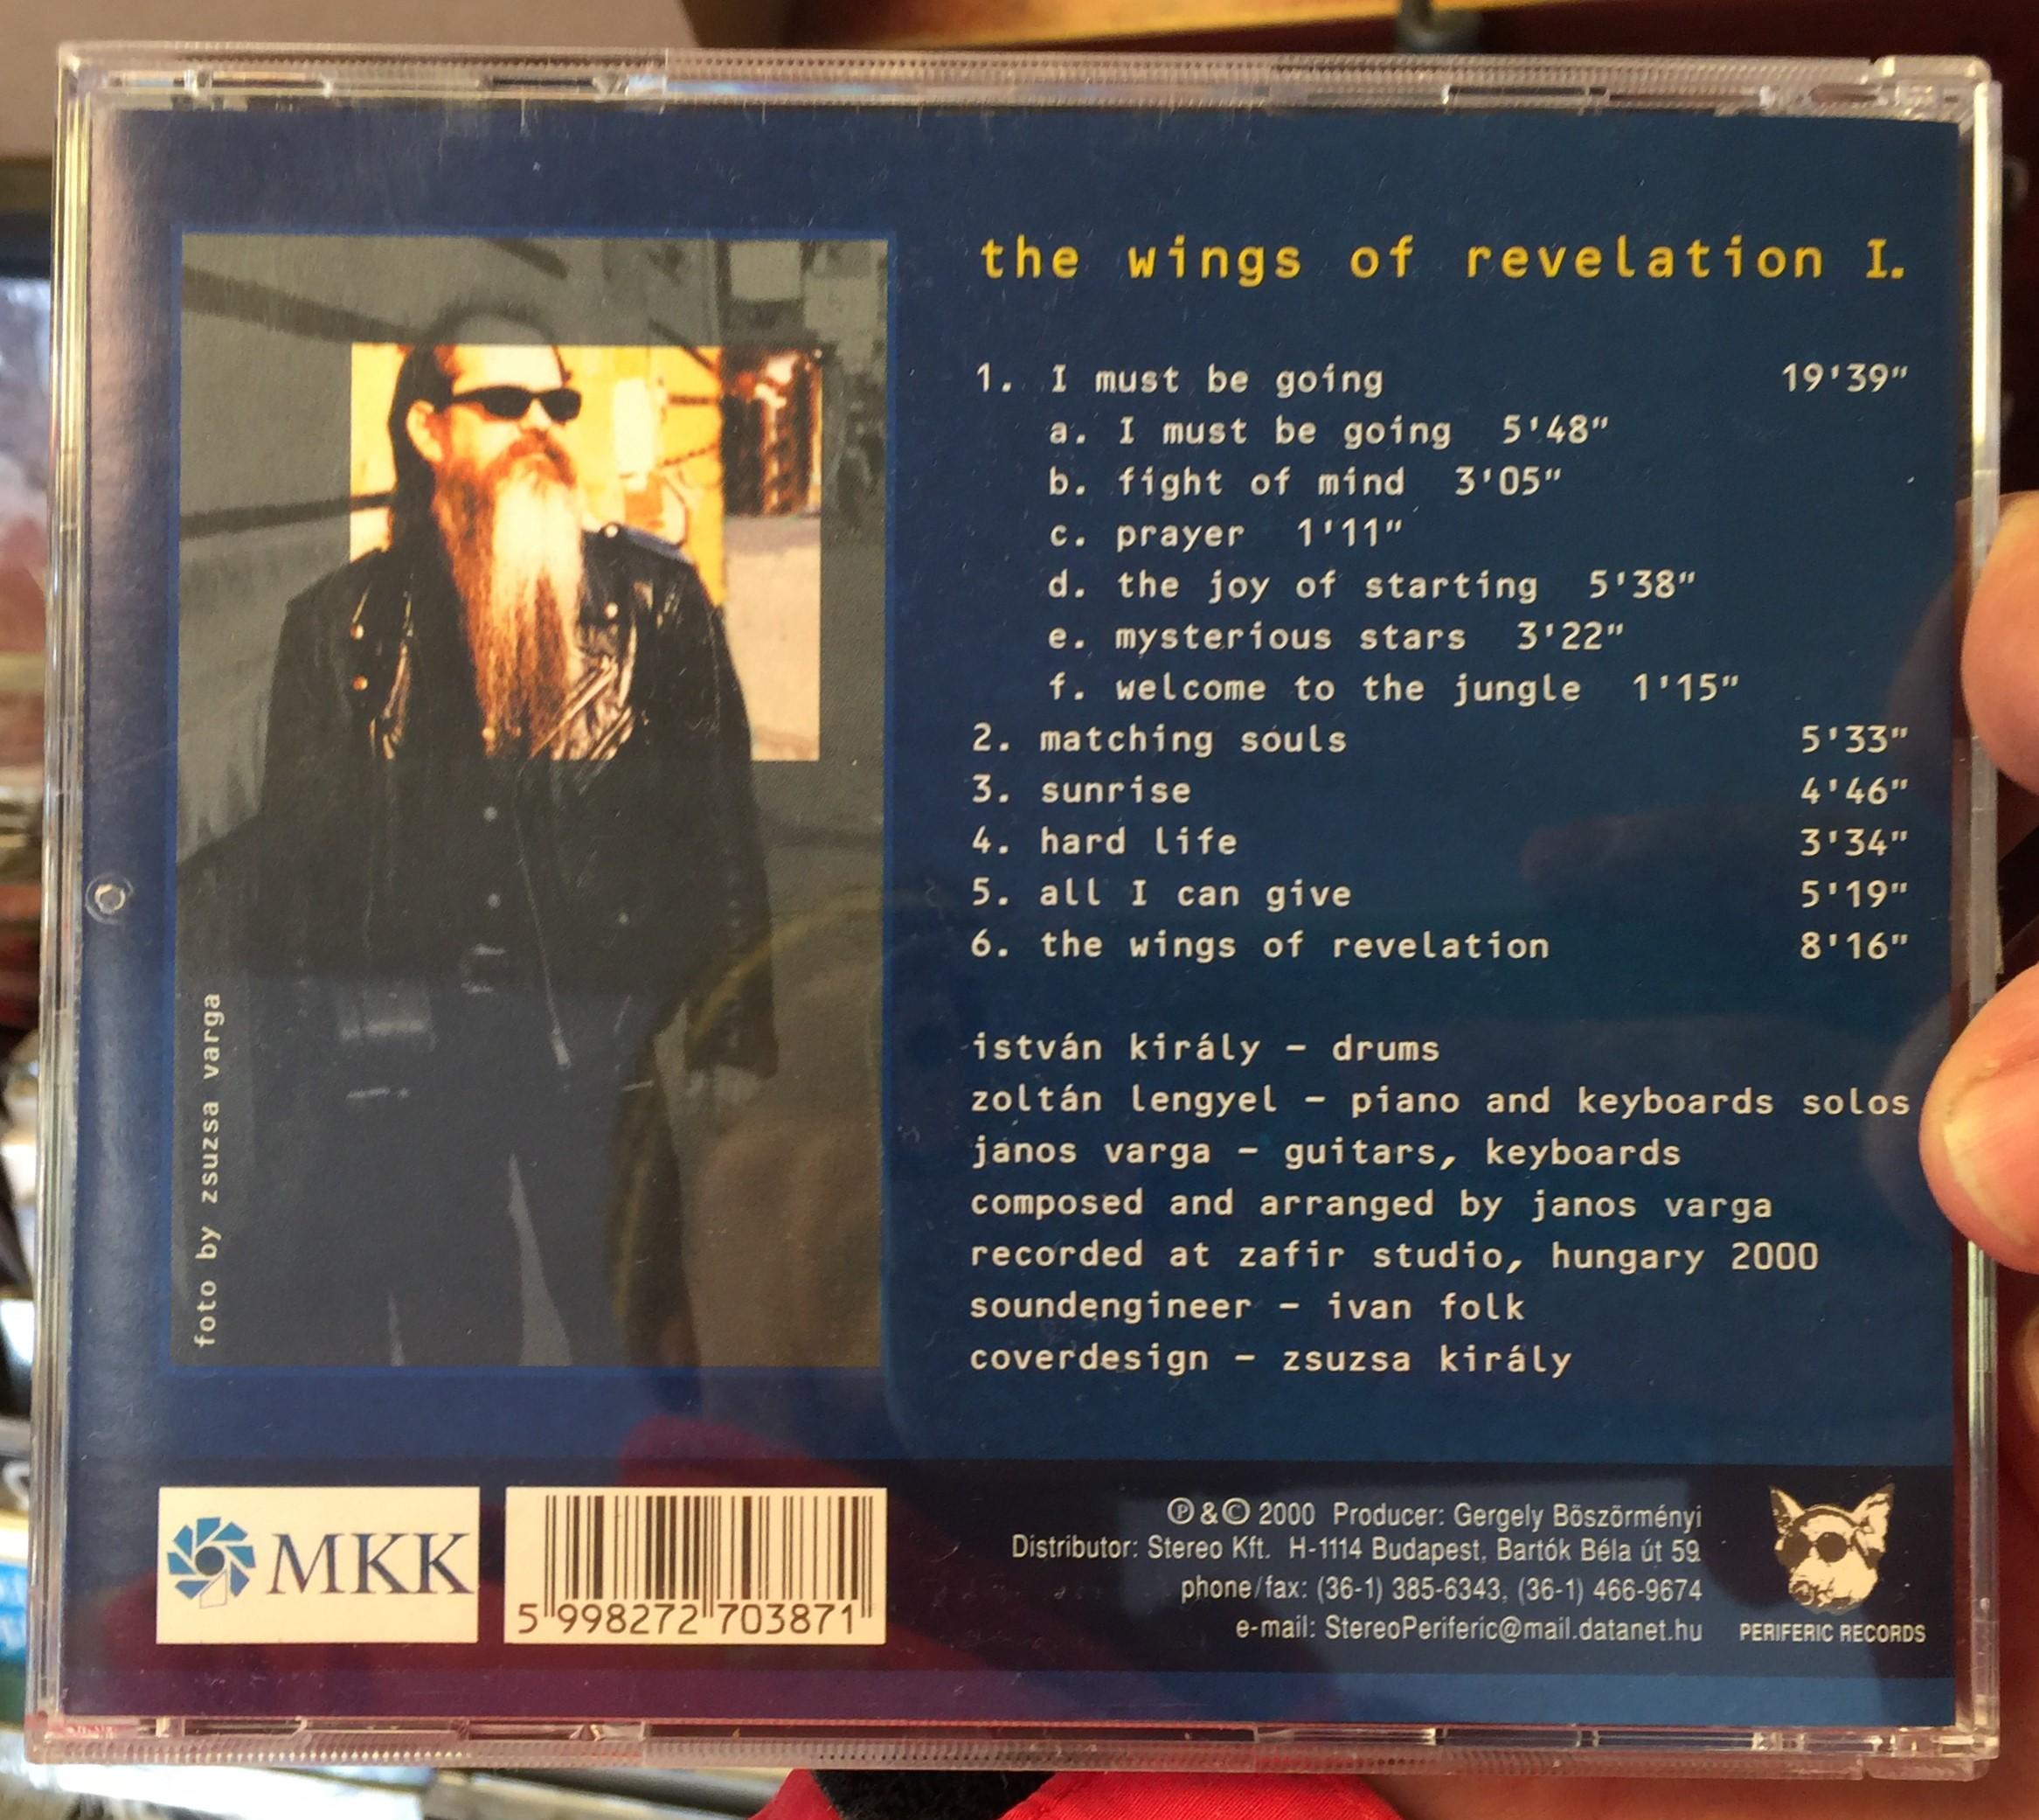 janos-varga-project-the-wings-of-revelation-i.-periferic-records-audio-cd-2000-bgcd-064-2-.jpg